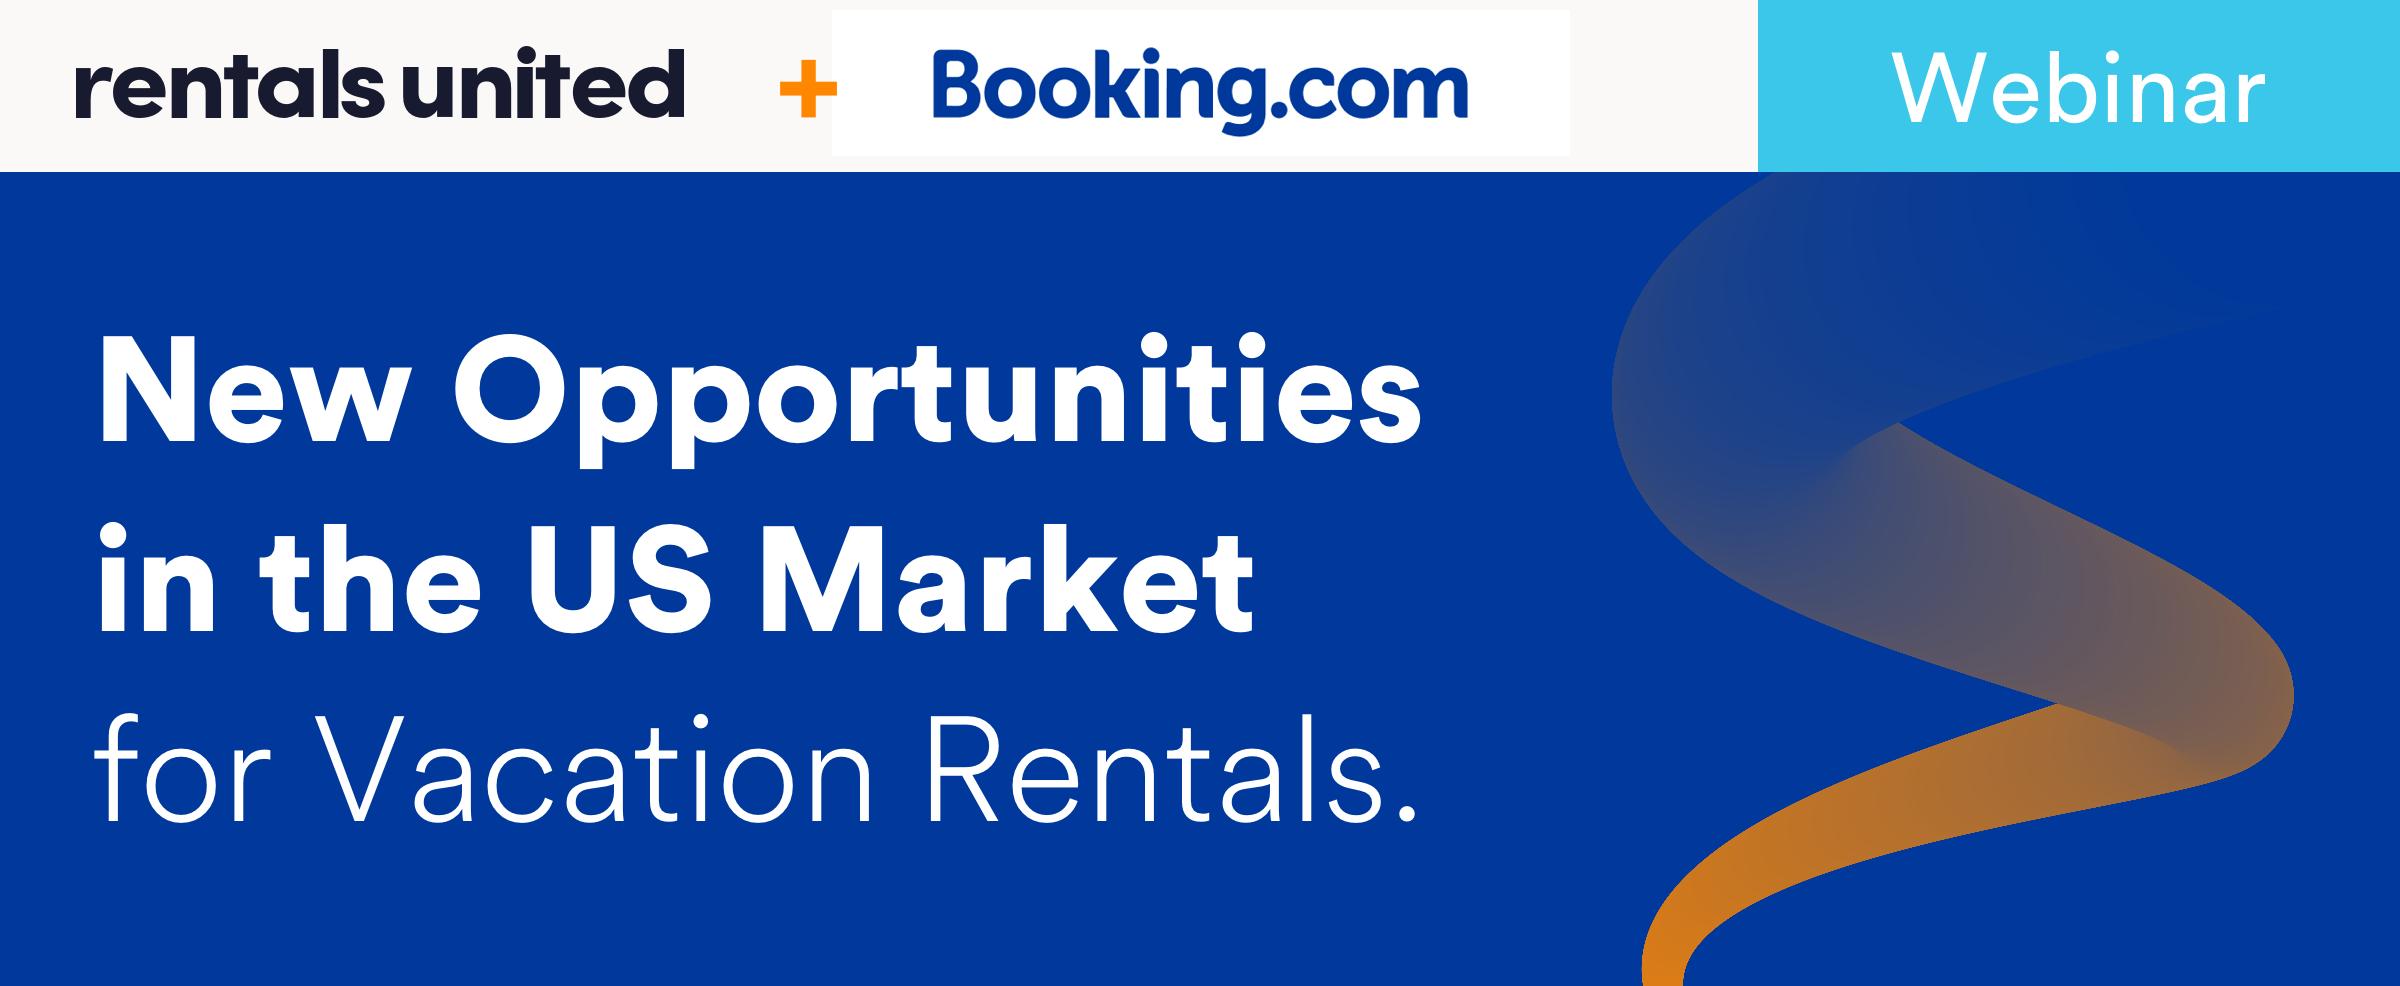 booking-NEW-OPP-US-MARKET-webinar-LANDING-1